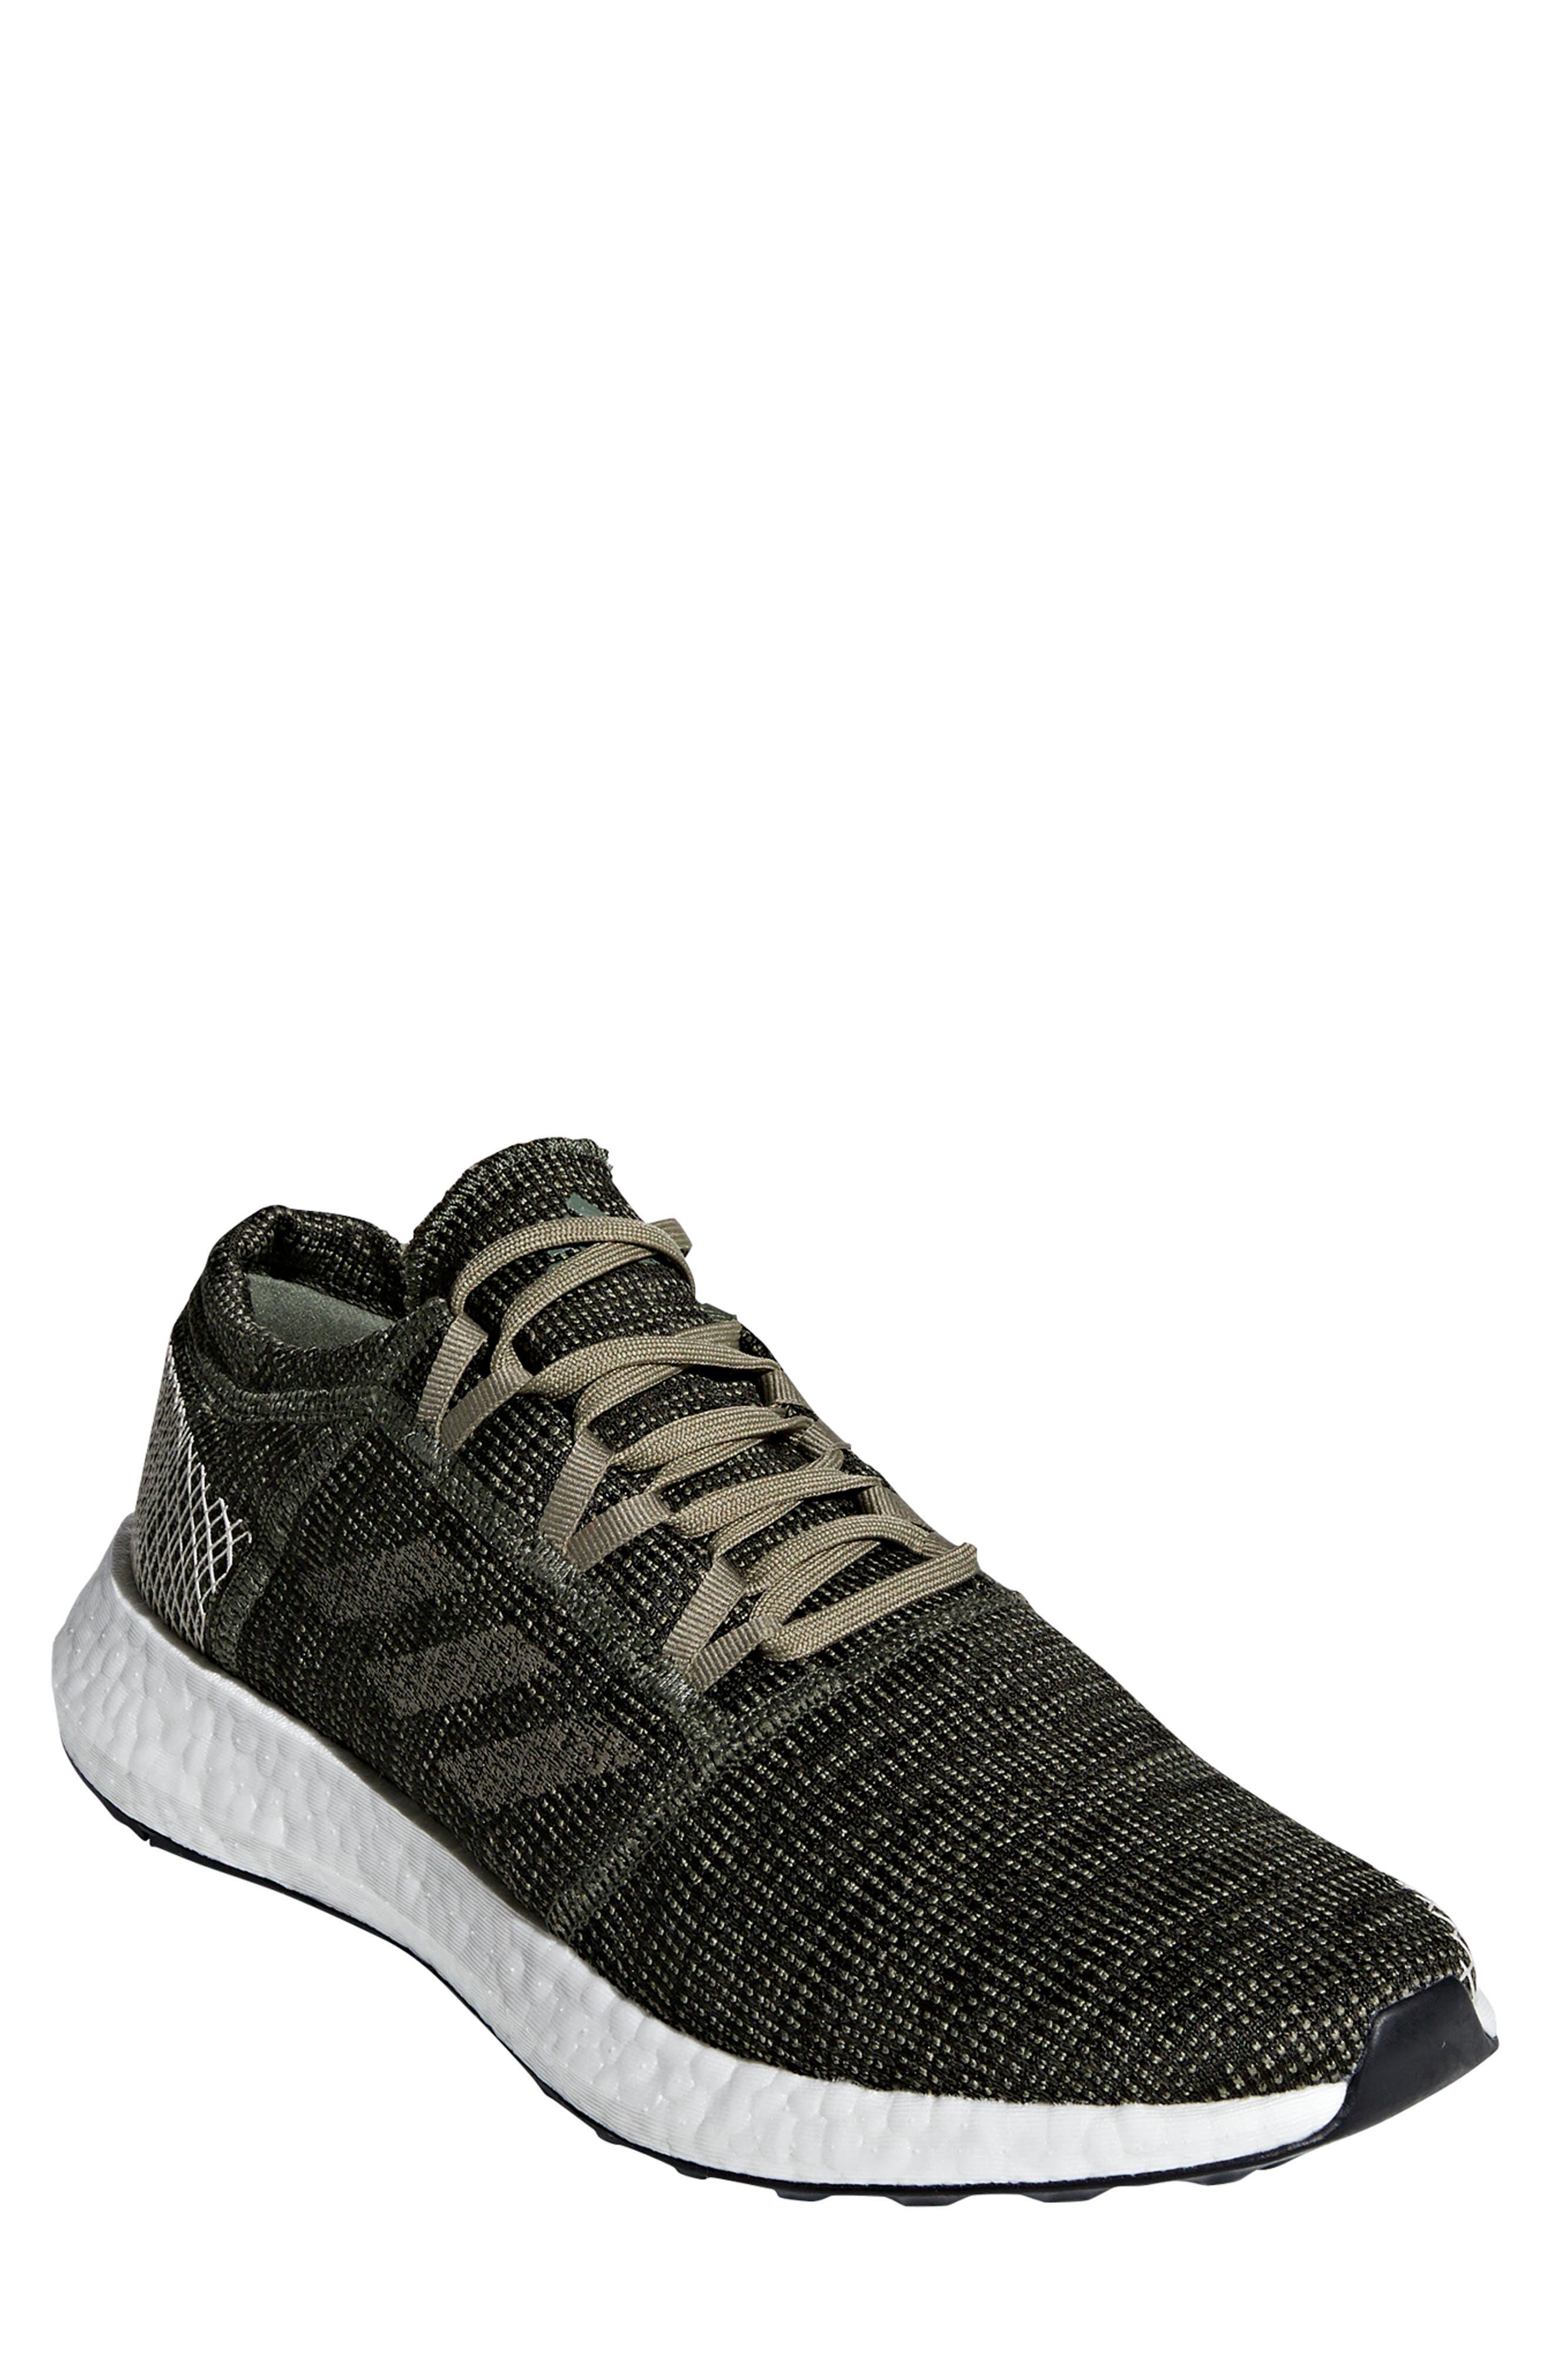 PureBoost GO Running Shoe,                             Main thumbnail 1, color,                             300